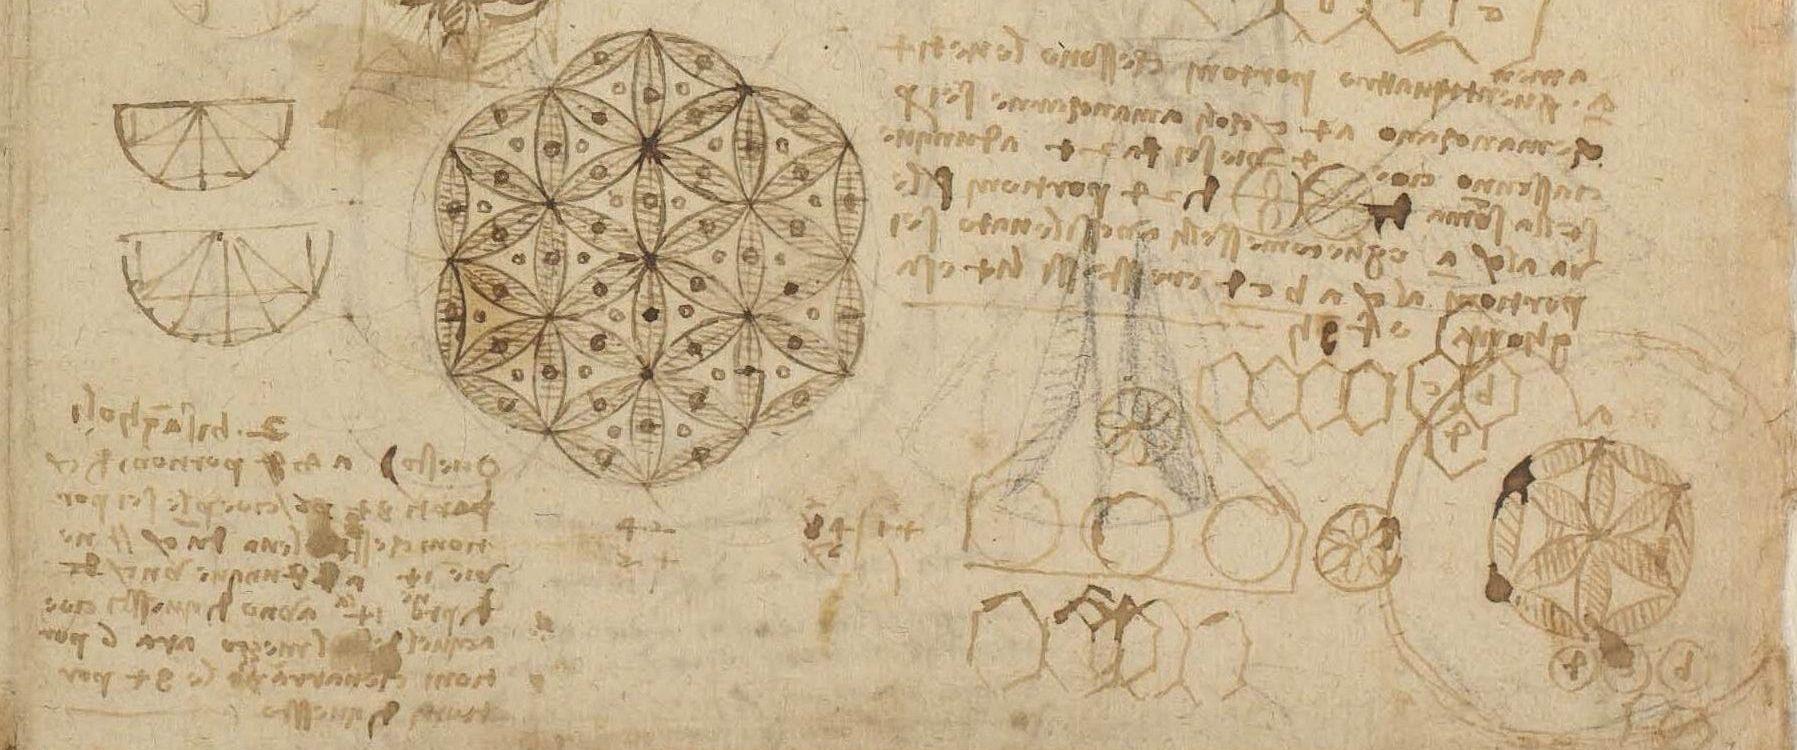 <p>CA f. 482 r: Studi di lunule e una nota in francese, 1517-18; dettaglio</p>